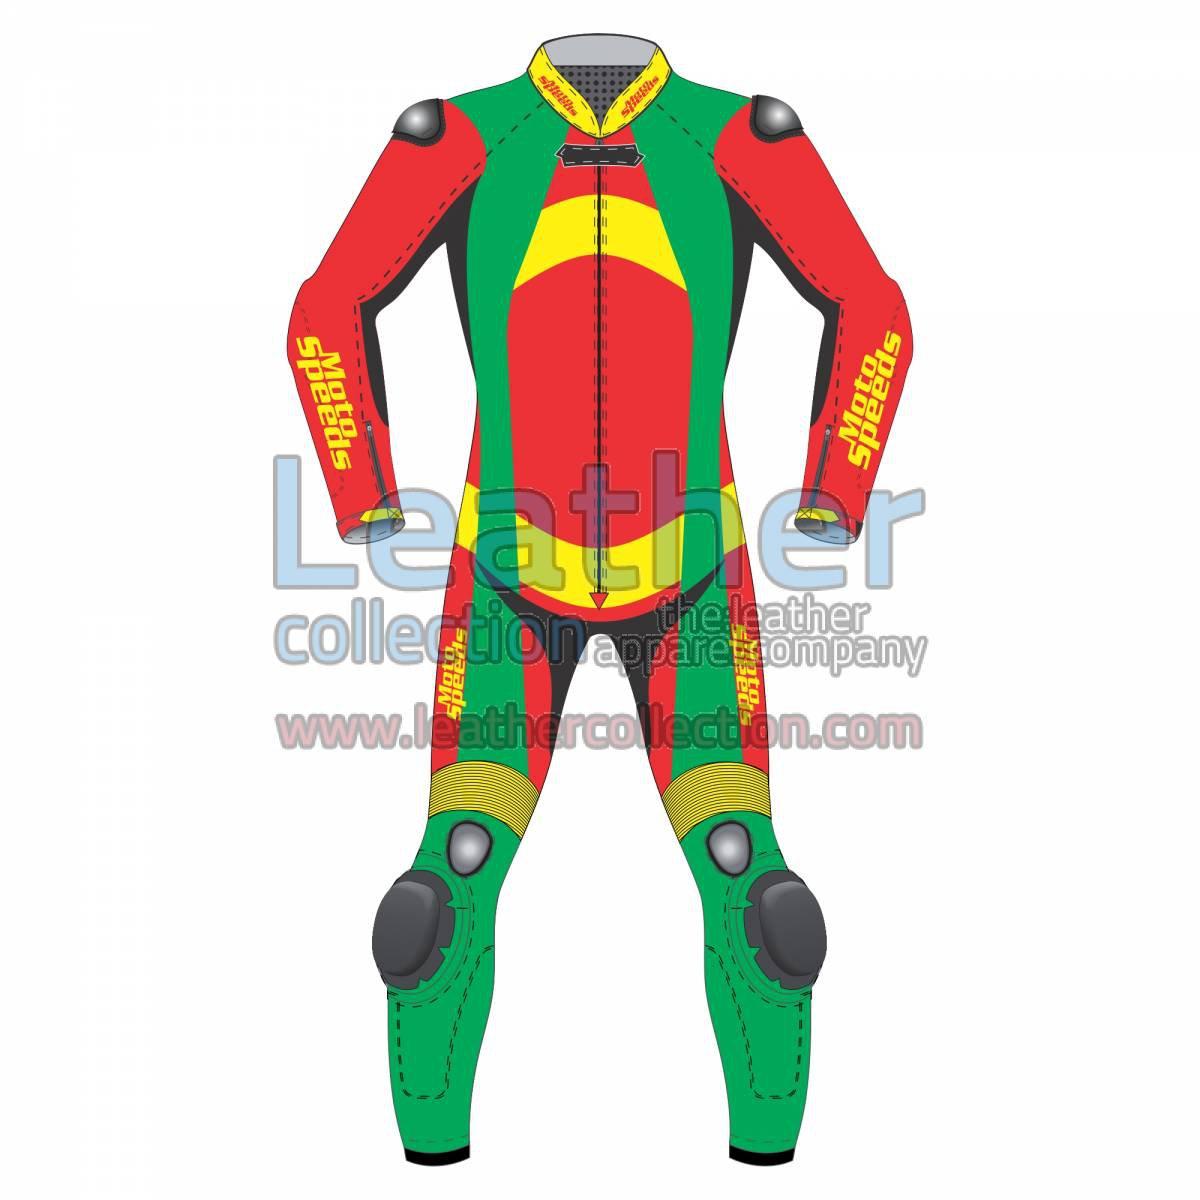 Bravo Leather Biker Suit